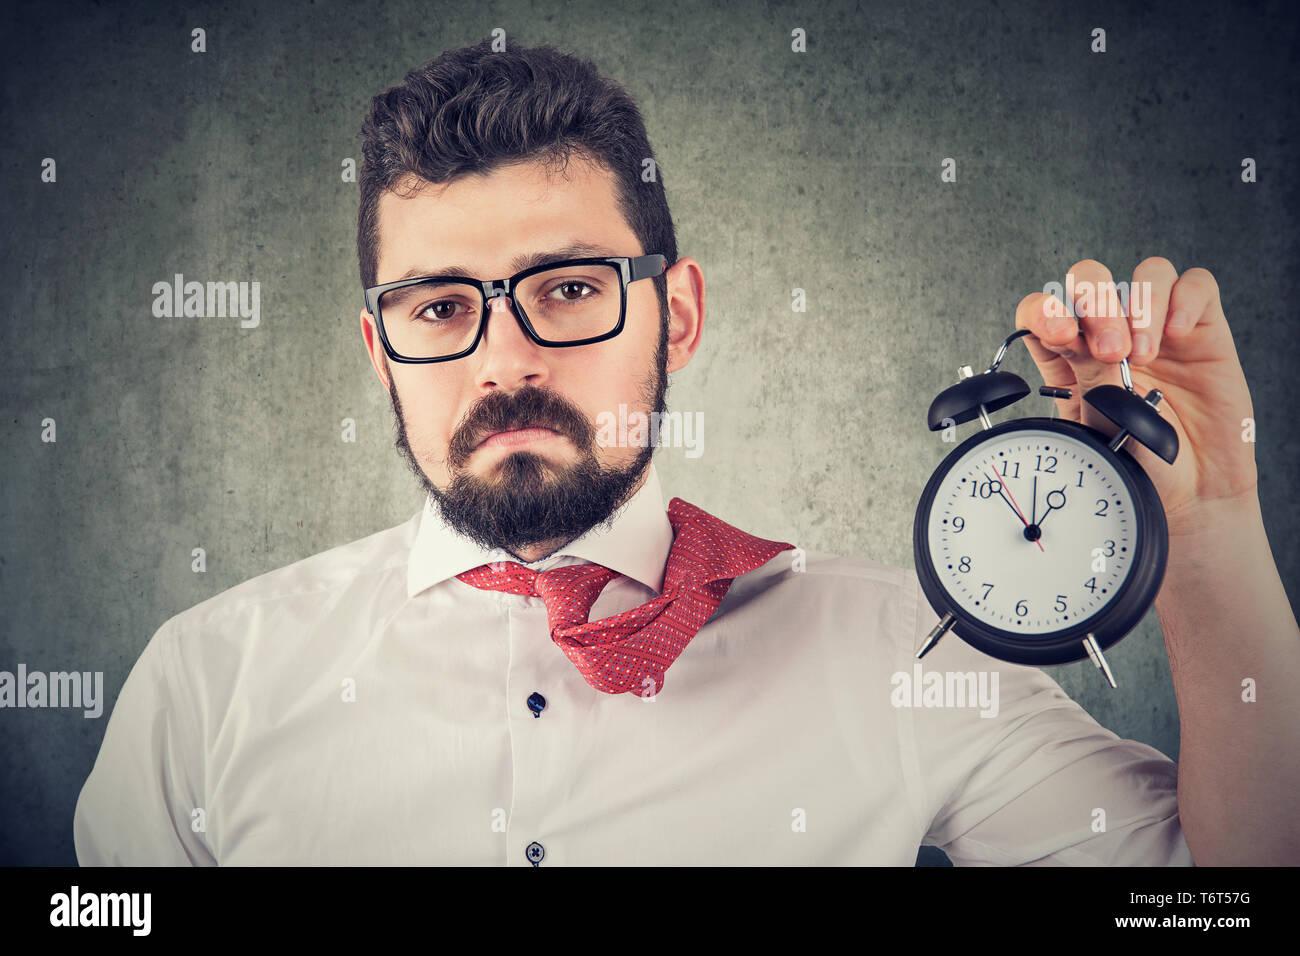 Sad overworked business man with alarm clock - Stock Image